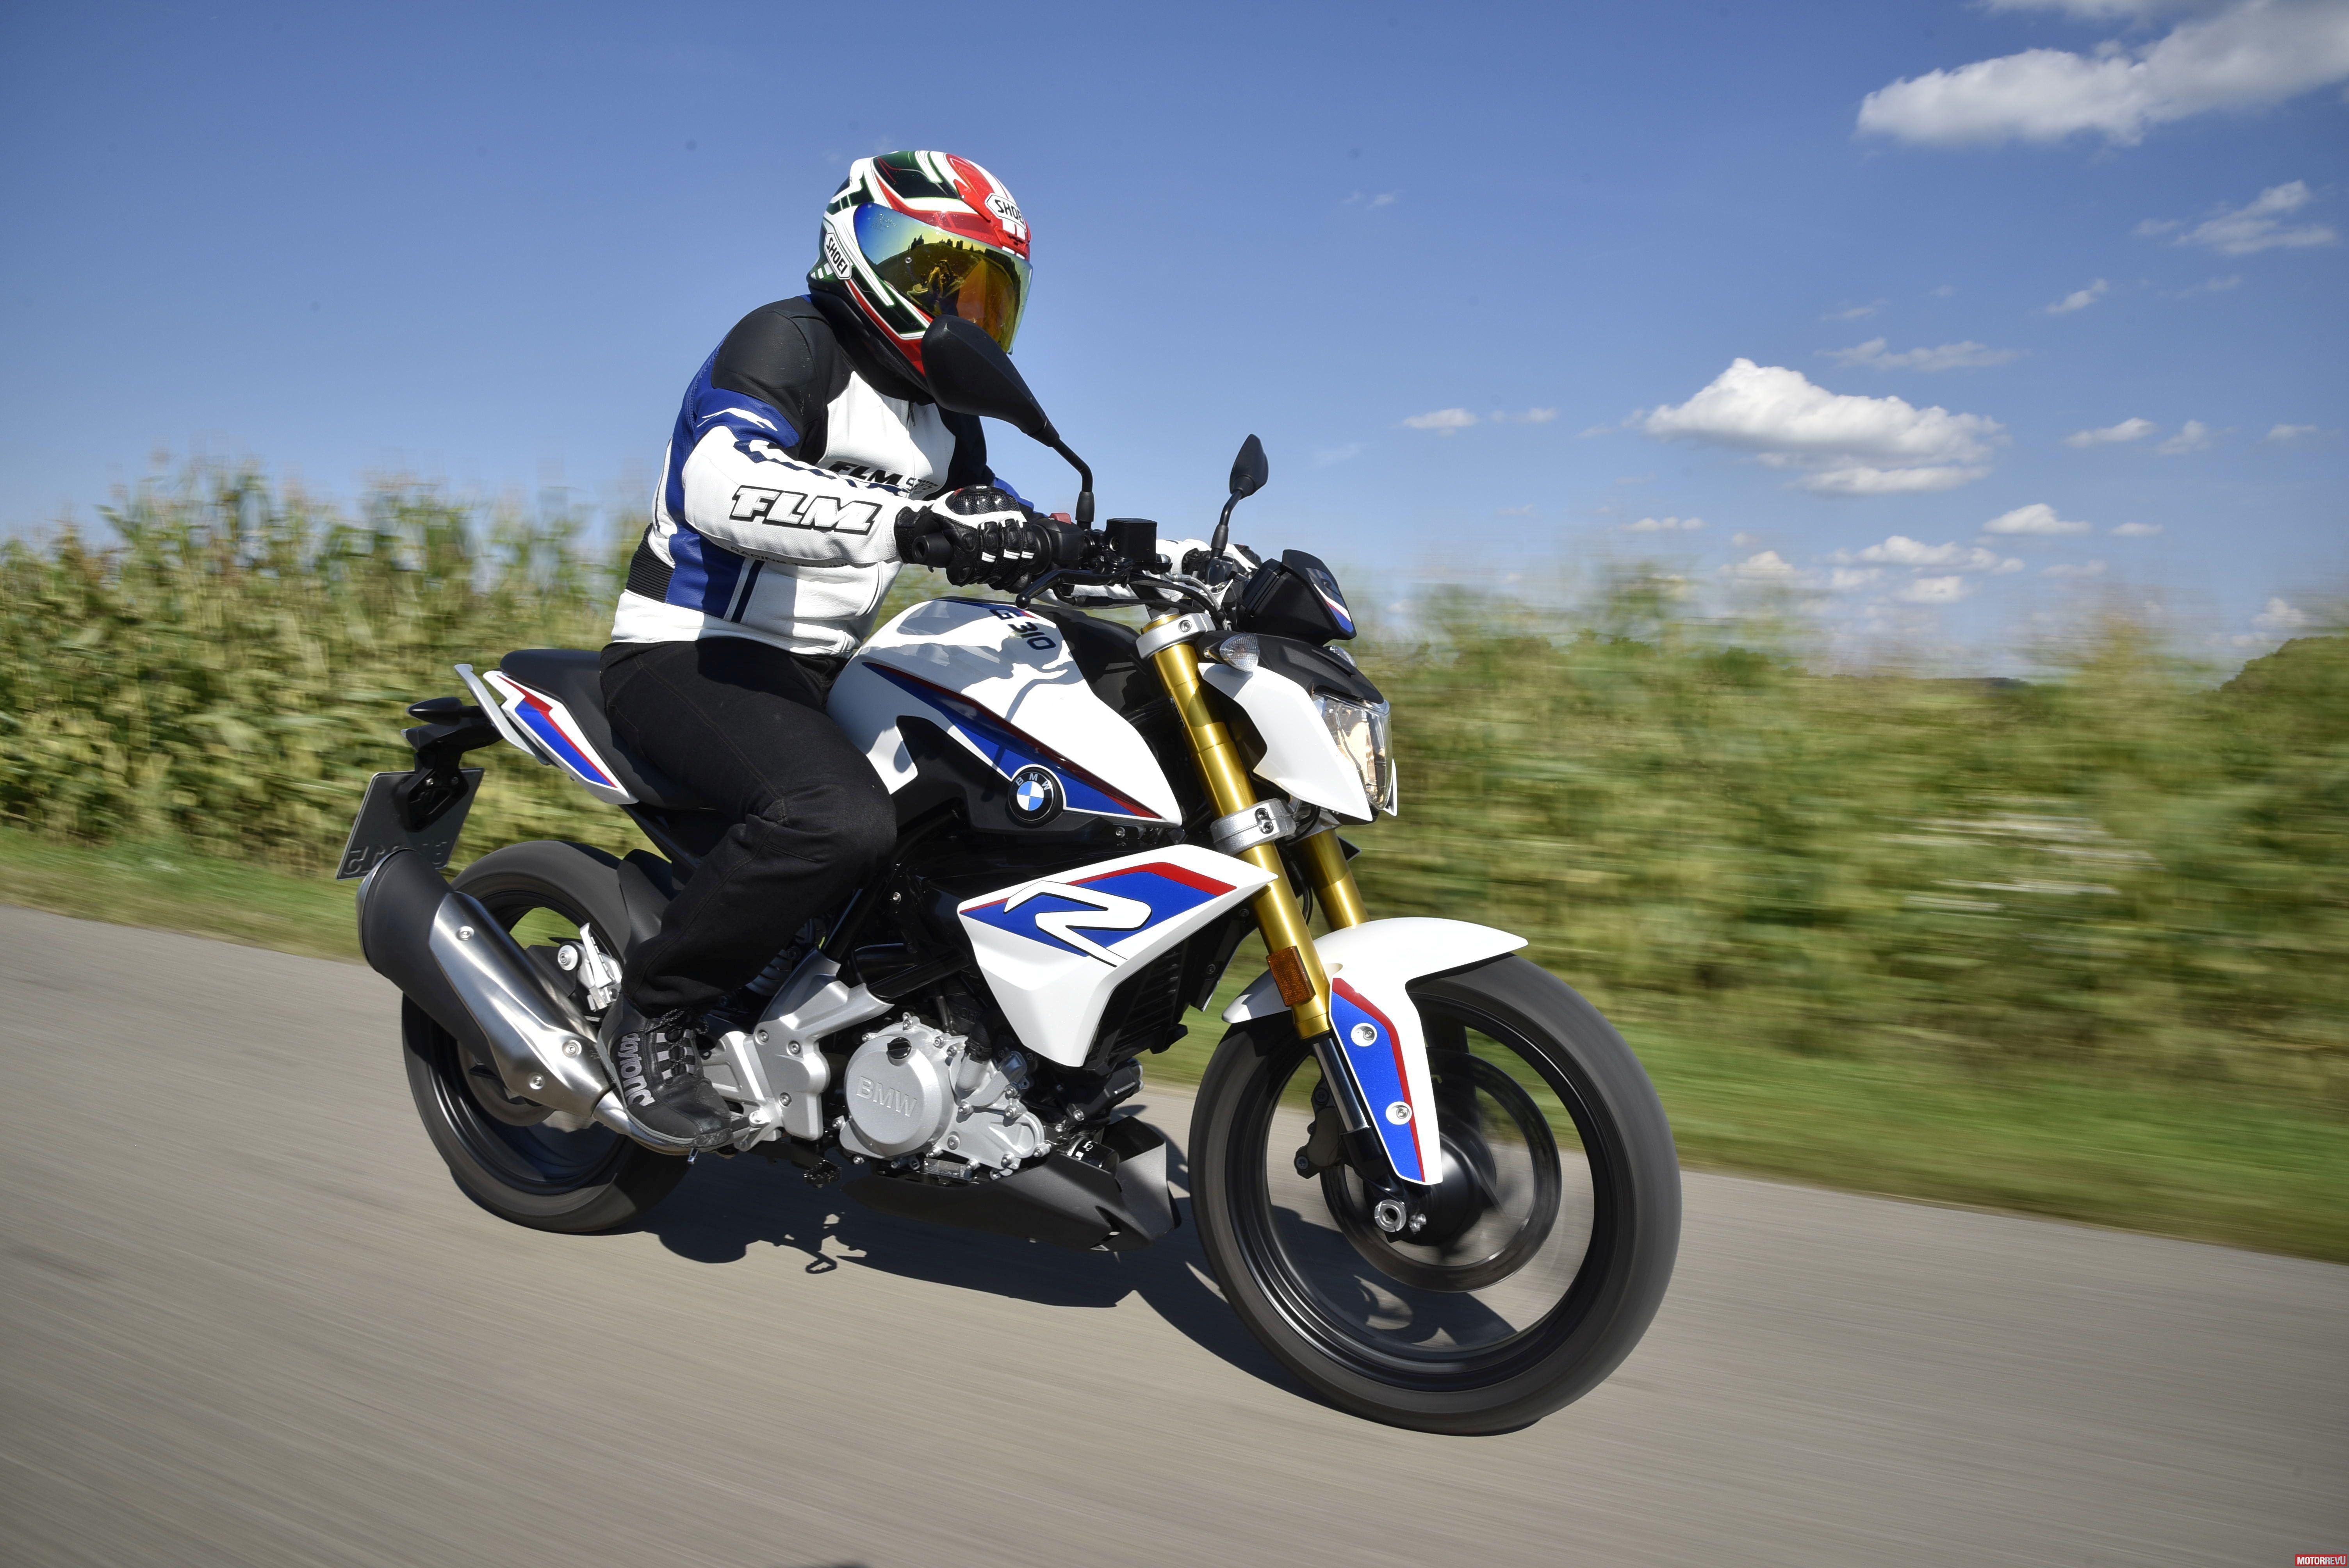 Motorok Tesztek galériája BMW G 310 R